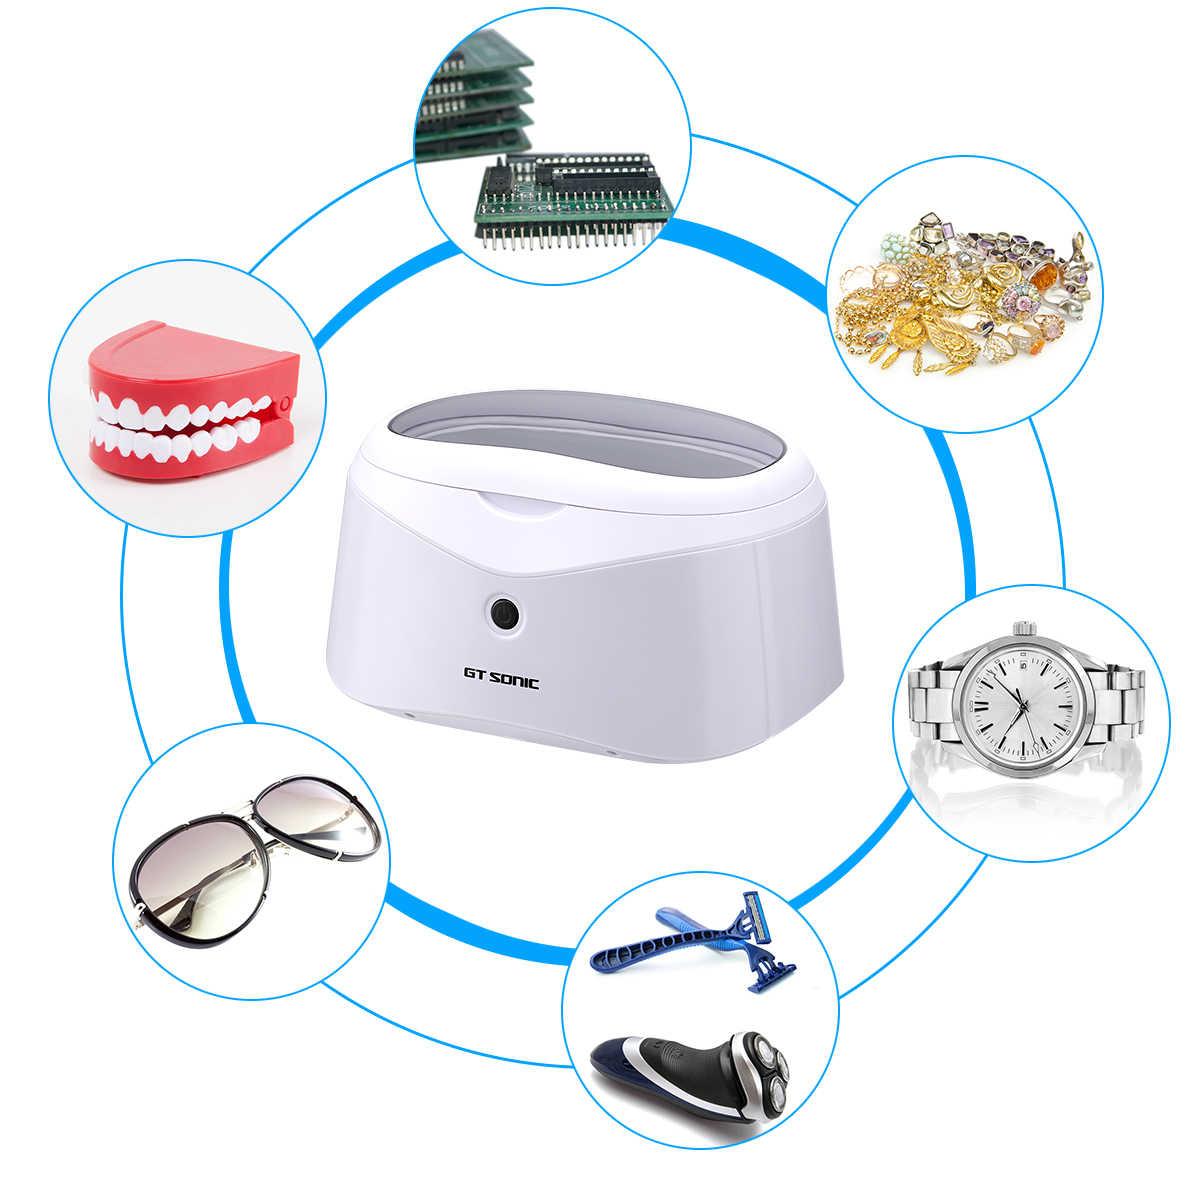 Gtsonic 600 Ml Ultrasonic High-Power Auto Shut-Off Ultrasonic Washer Bath Cleaner untuk Perhiasan Jam Tangan Kacamata gigi